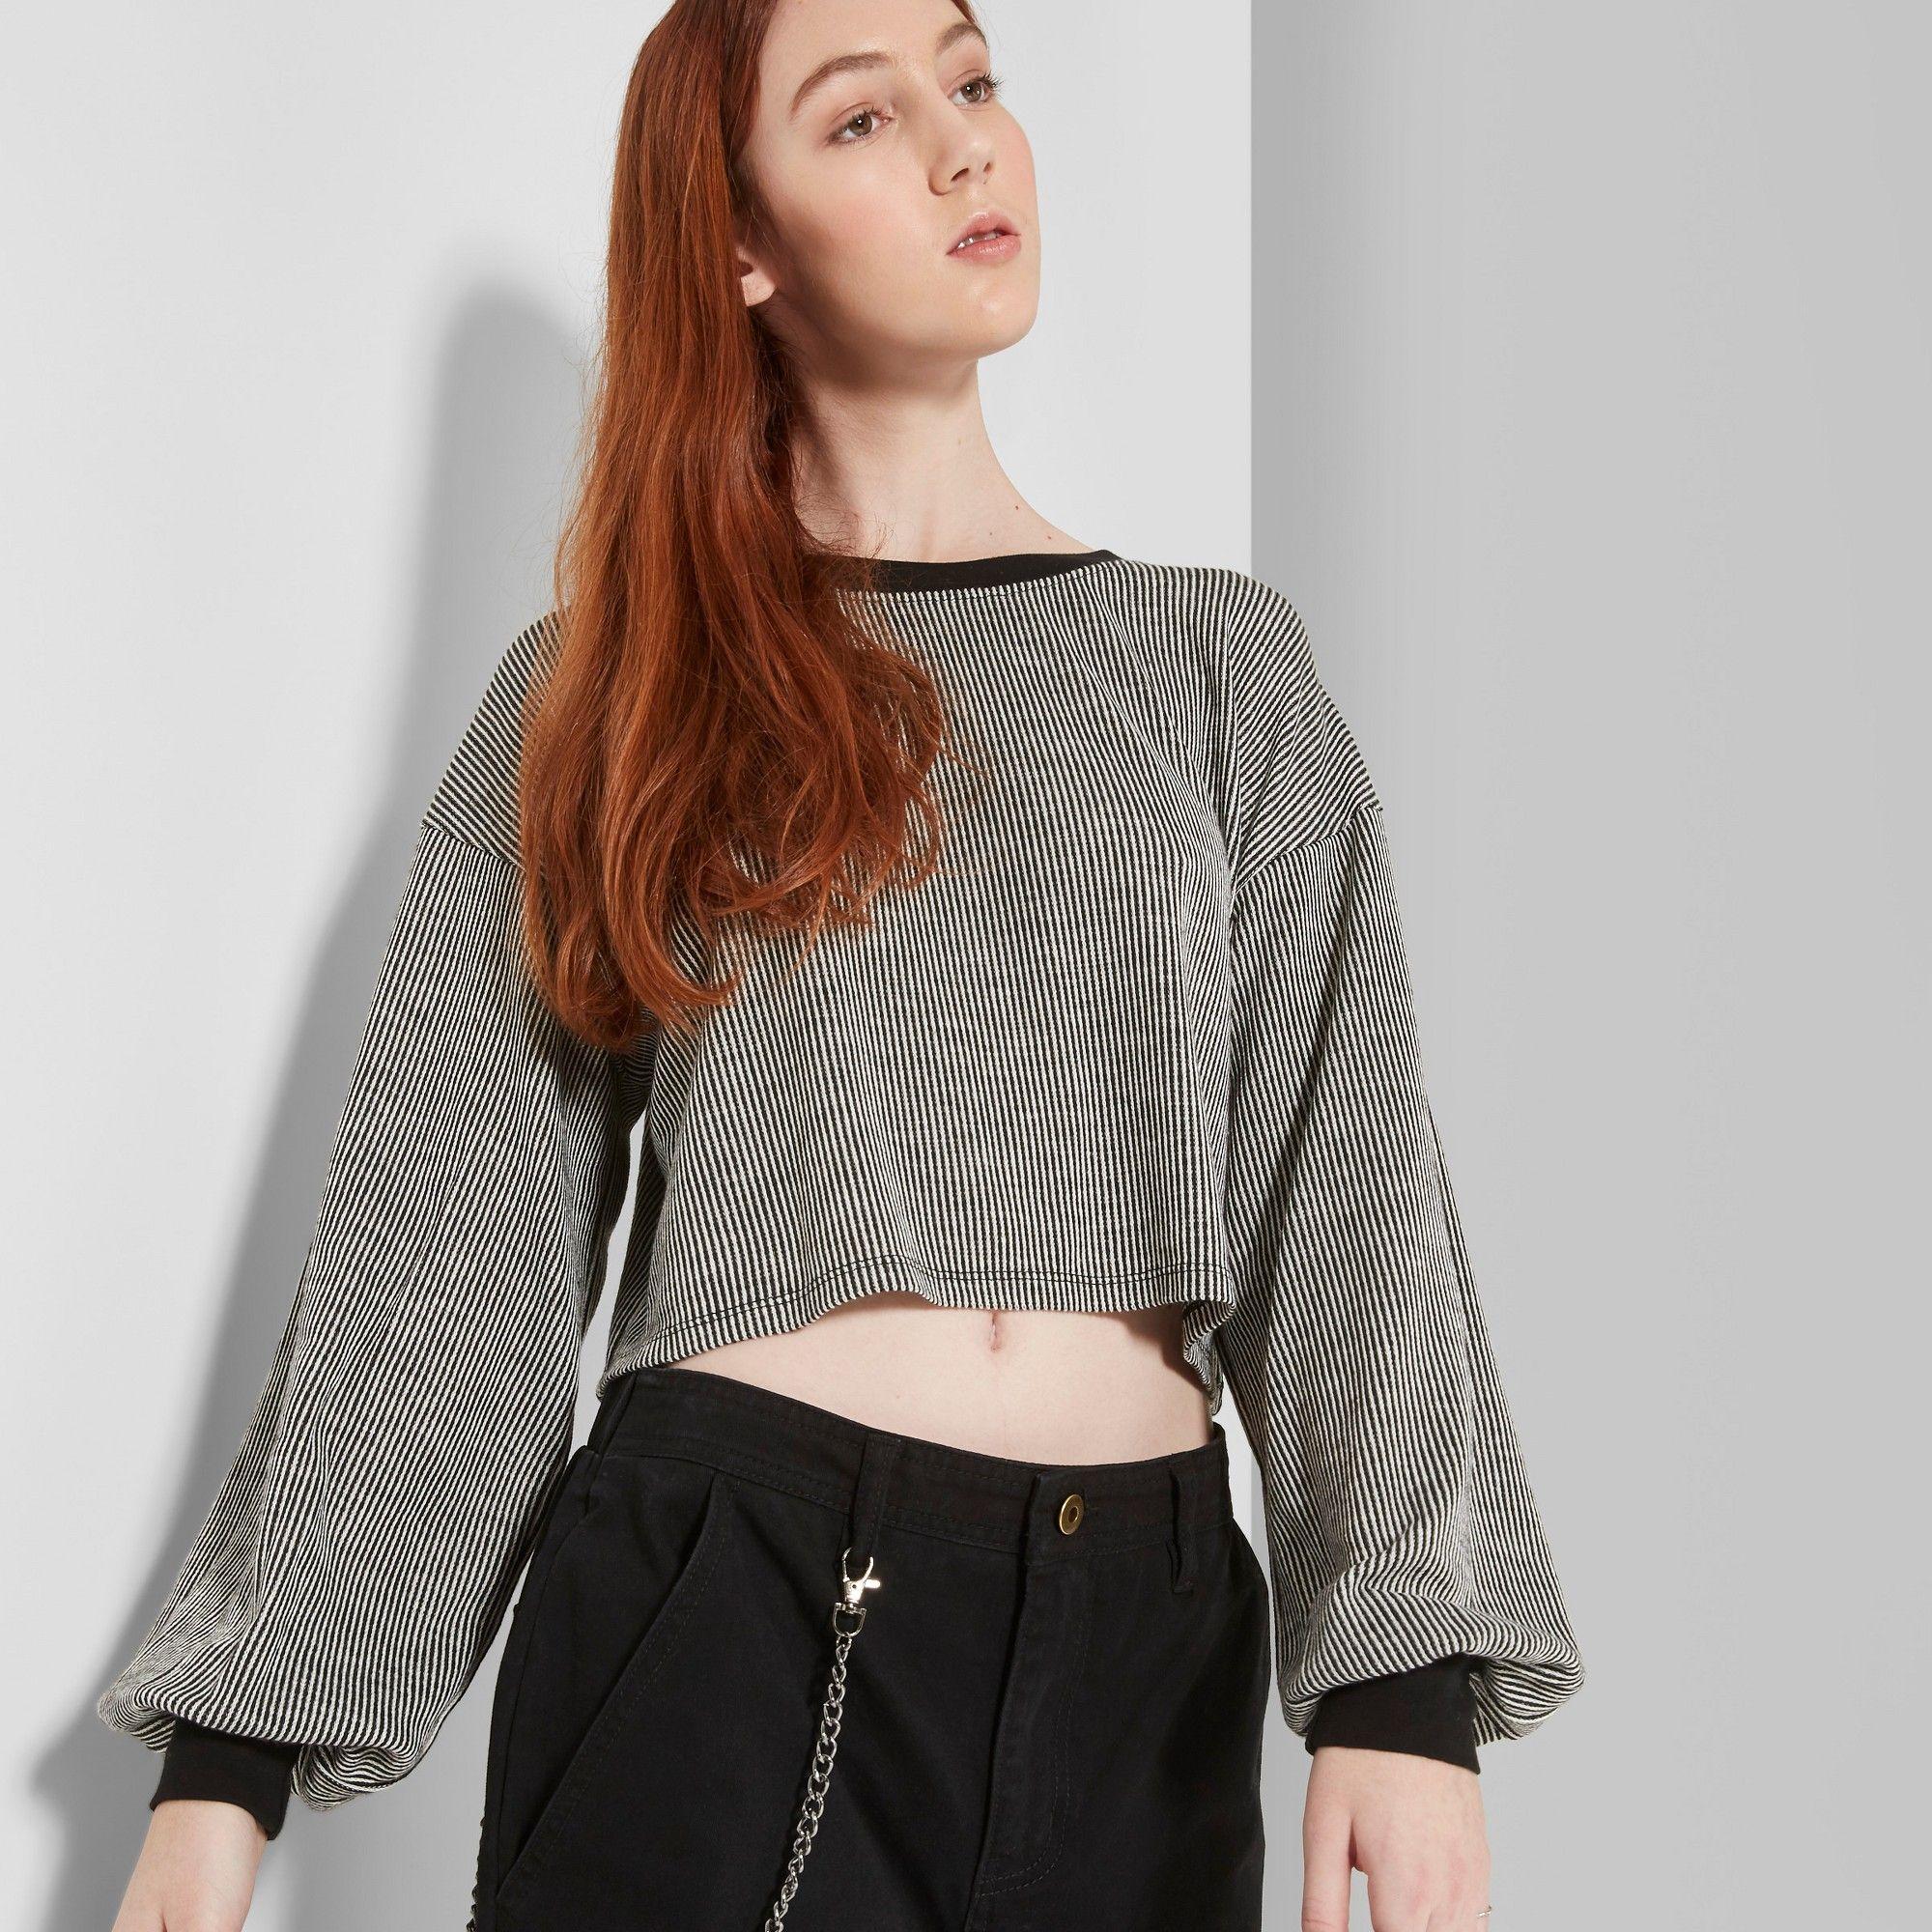 Women's Striped Long Sleeve Round Neck Rib Sweater Knit